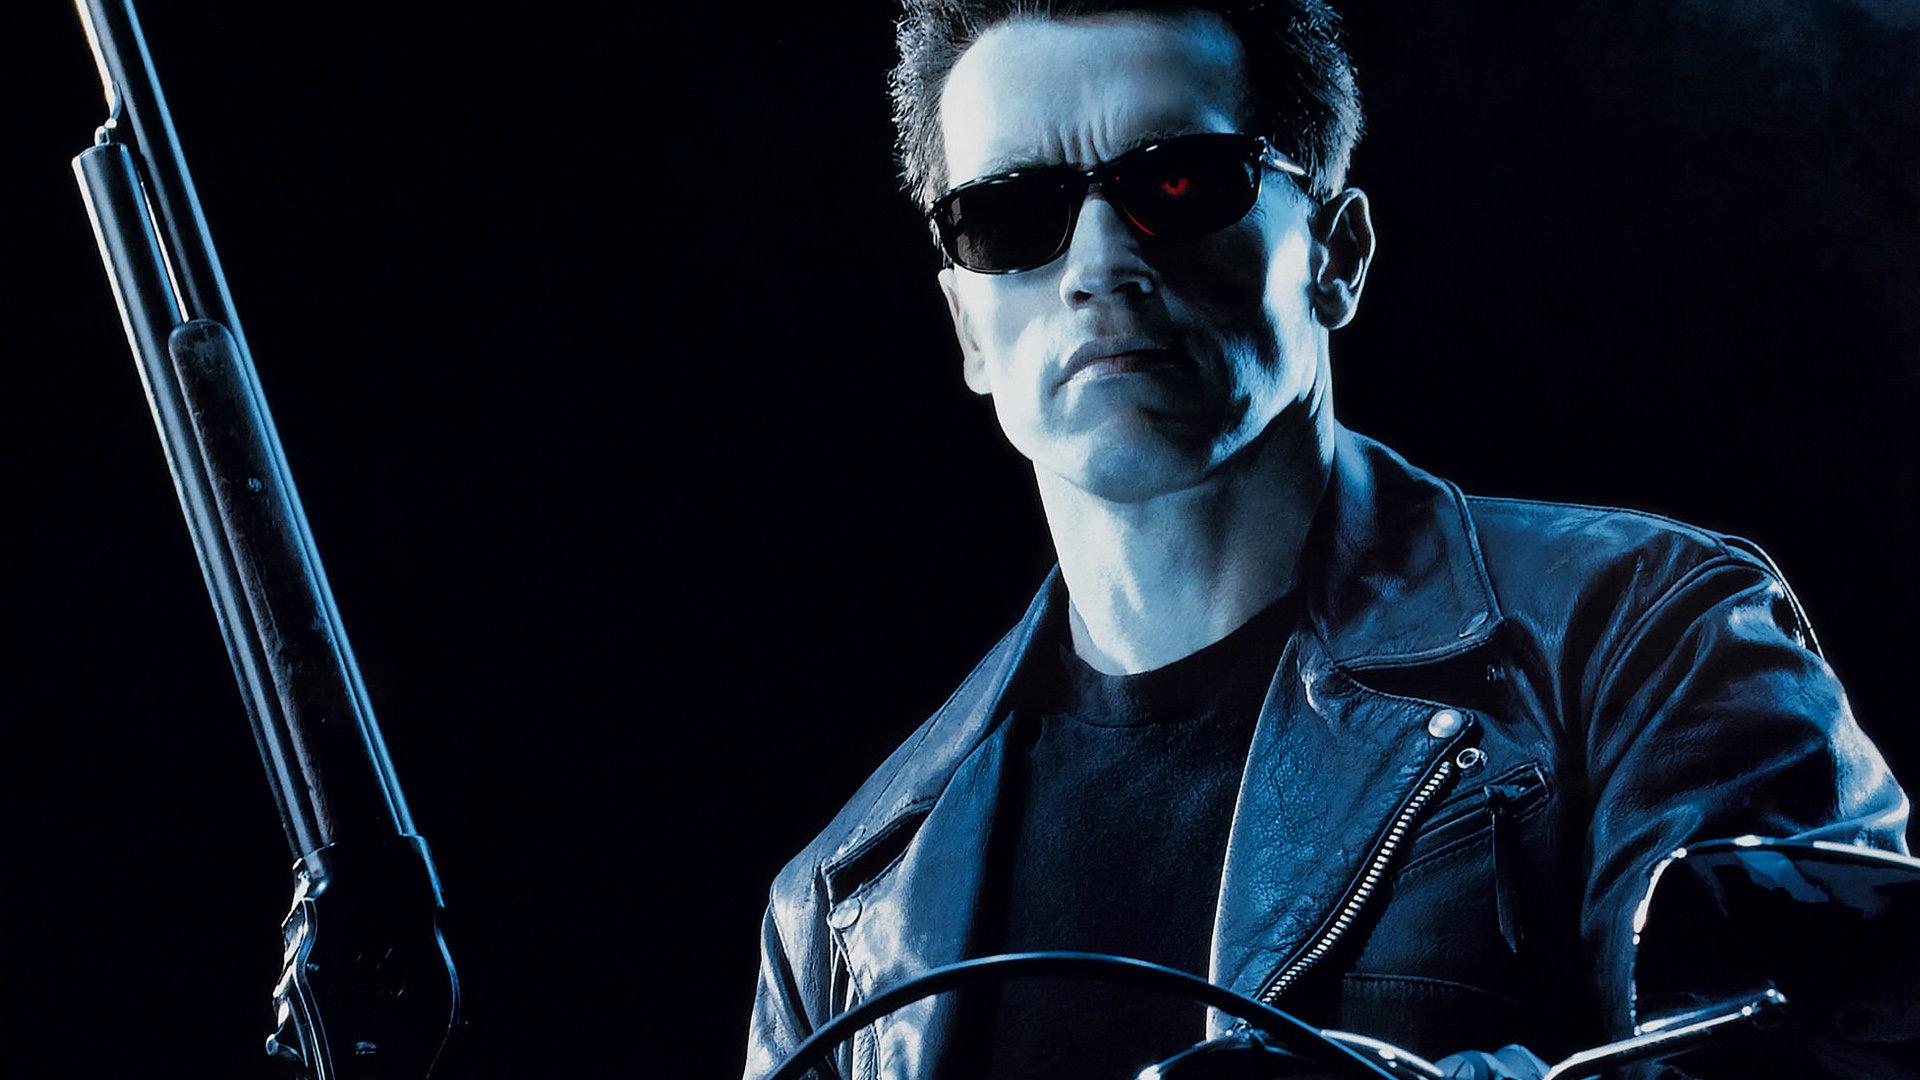 iconic science fiction movie images borgcom